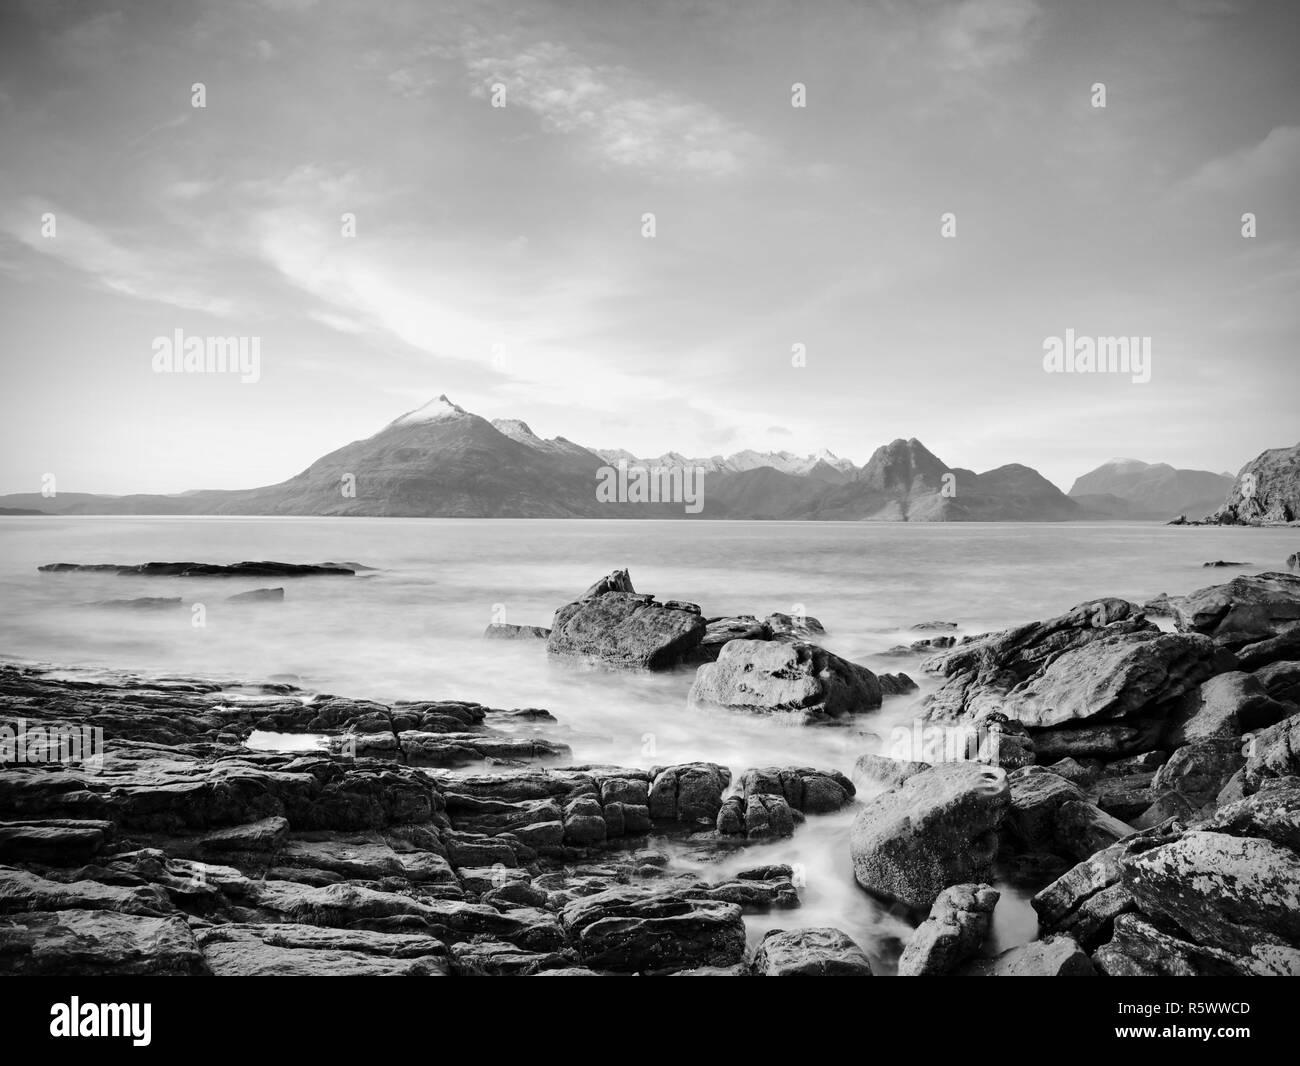 The stony beach and cliff of rocky bay. Blue tones of February sunset, pink horizon.  Dark slipery boulders with deep cracks. - Stock Image